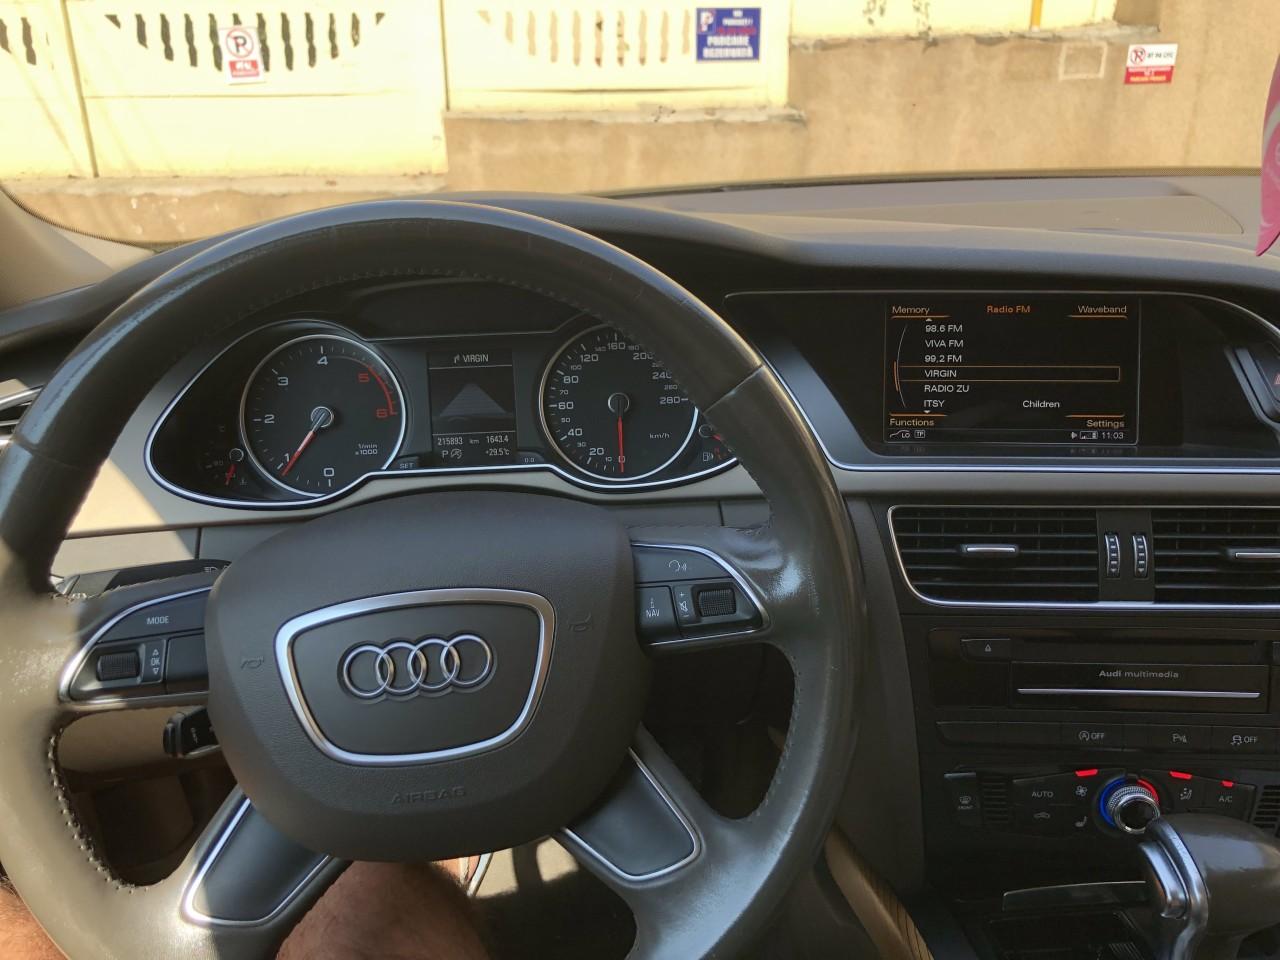 Audi A4 2.0 TDI 2015